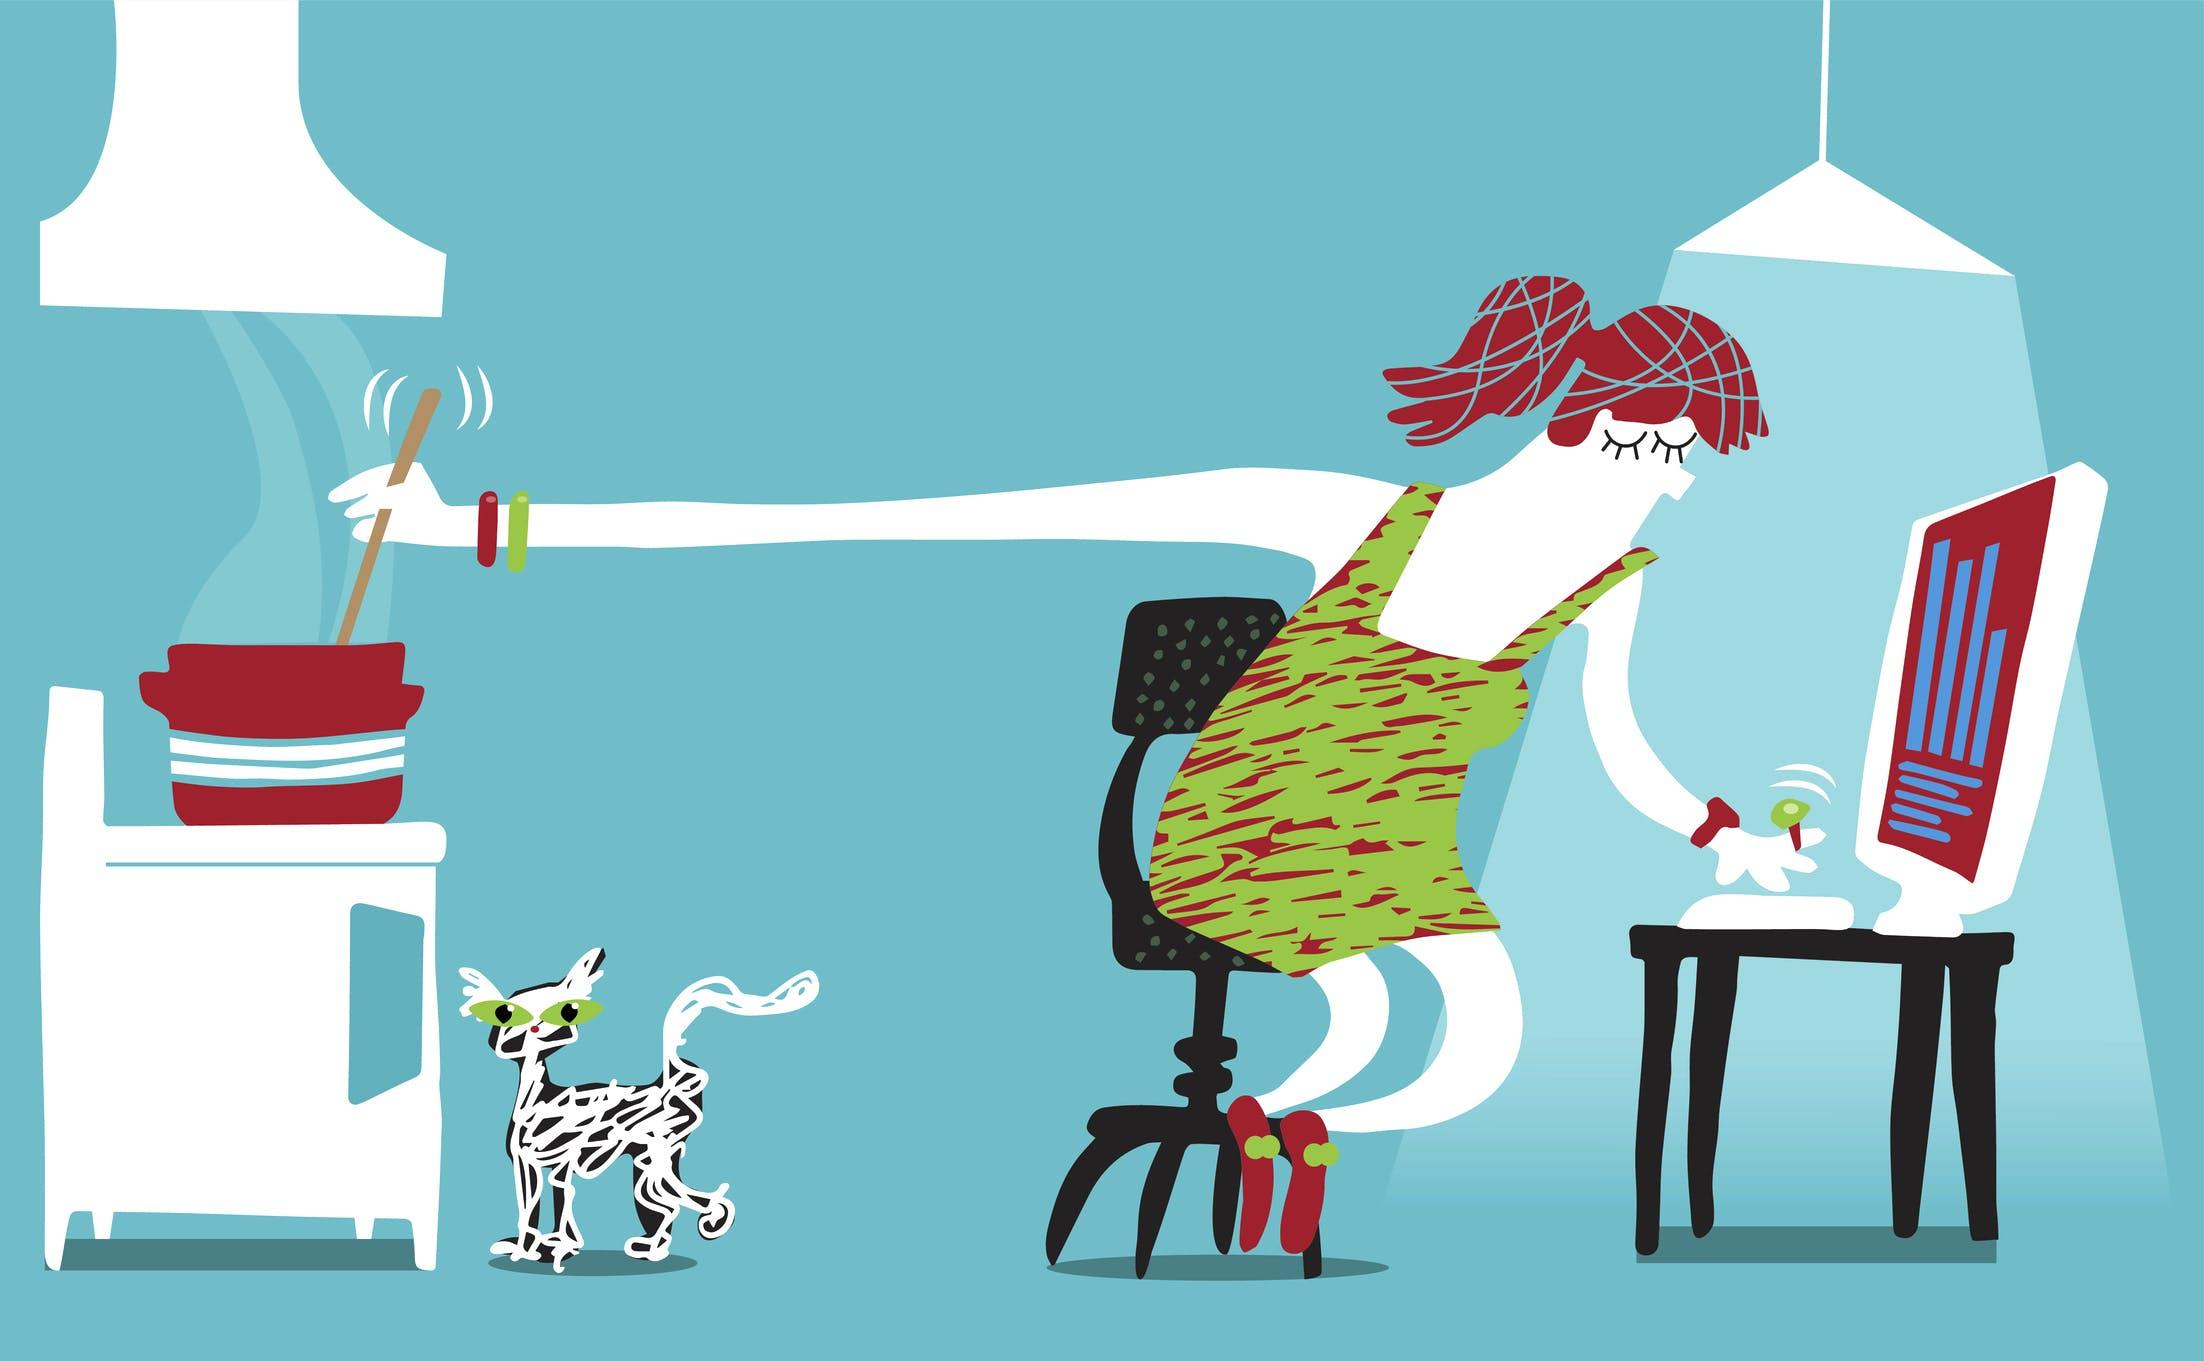 agile working, flexible, home, freelance lawyering